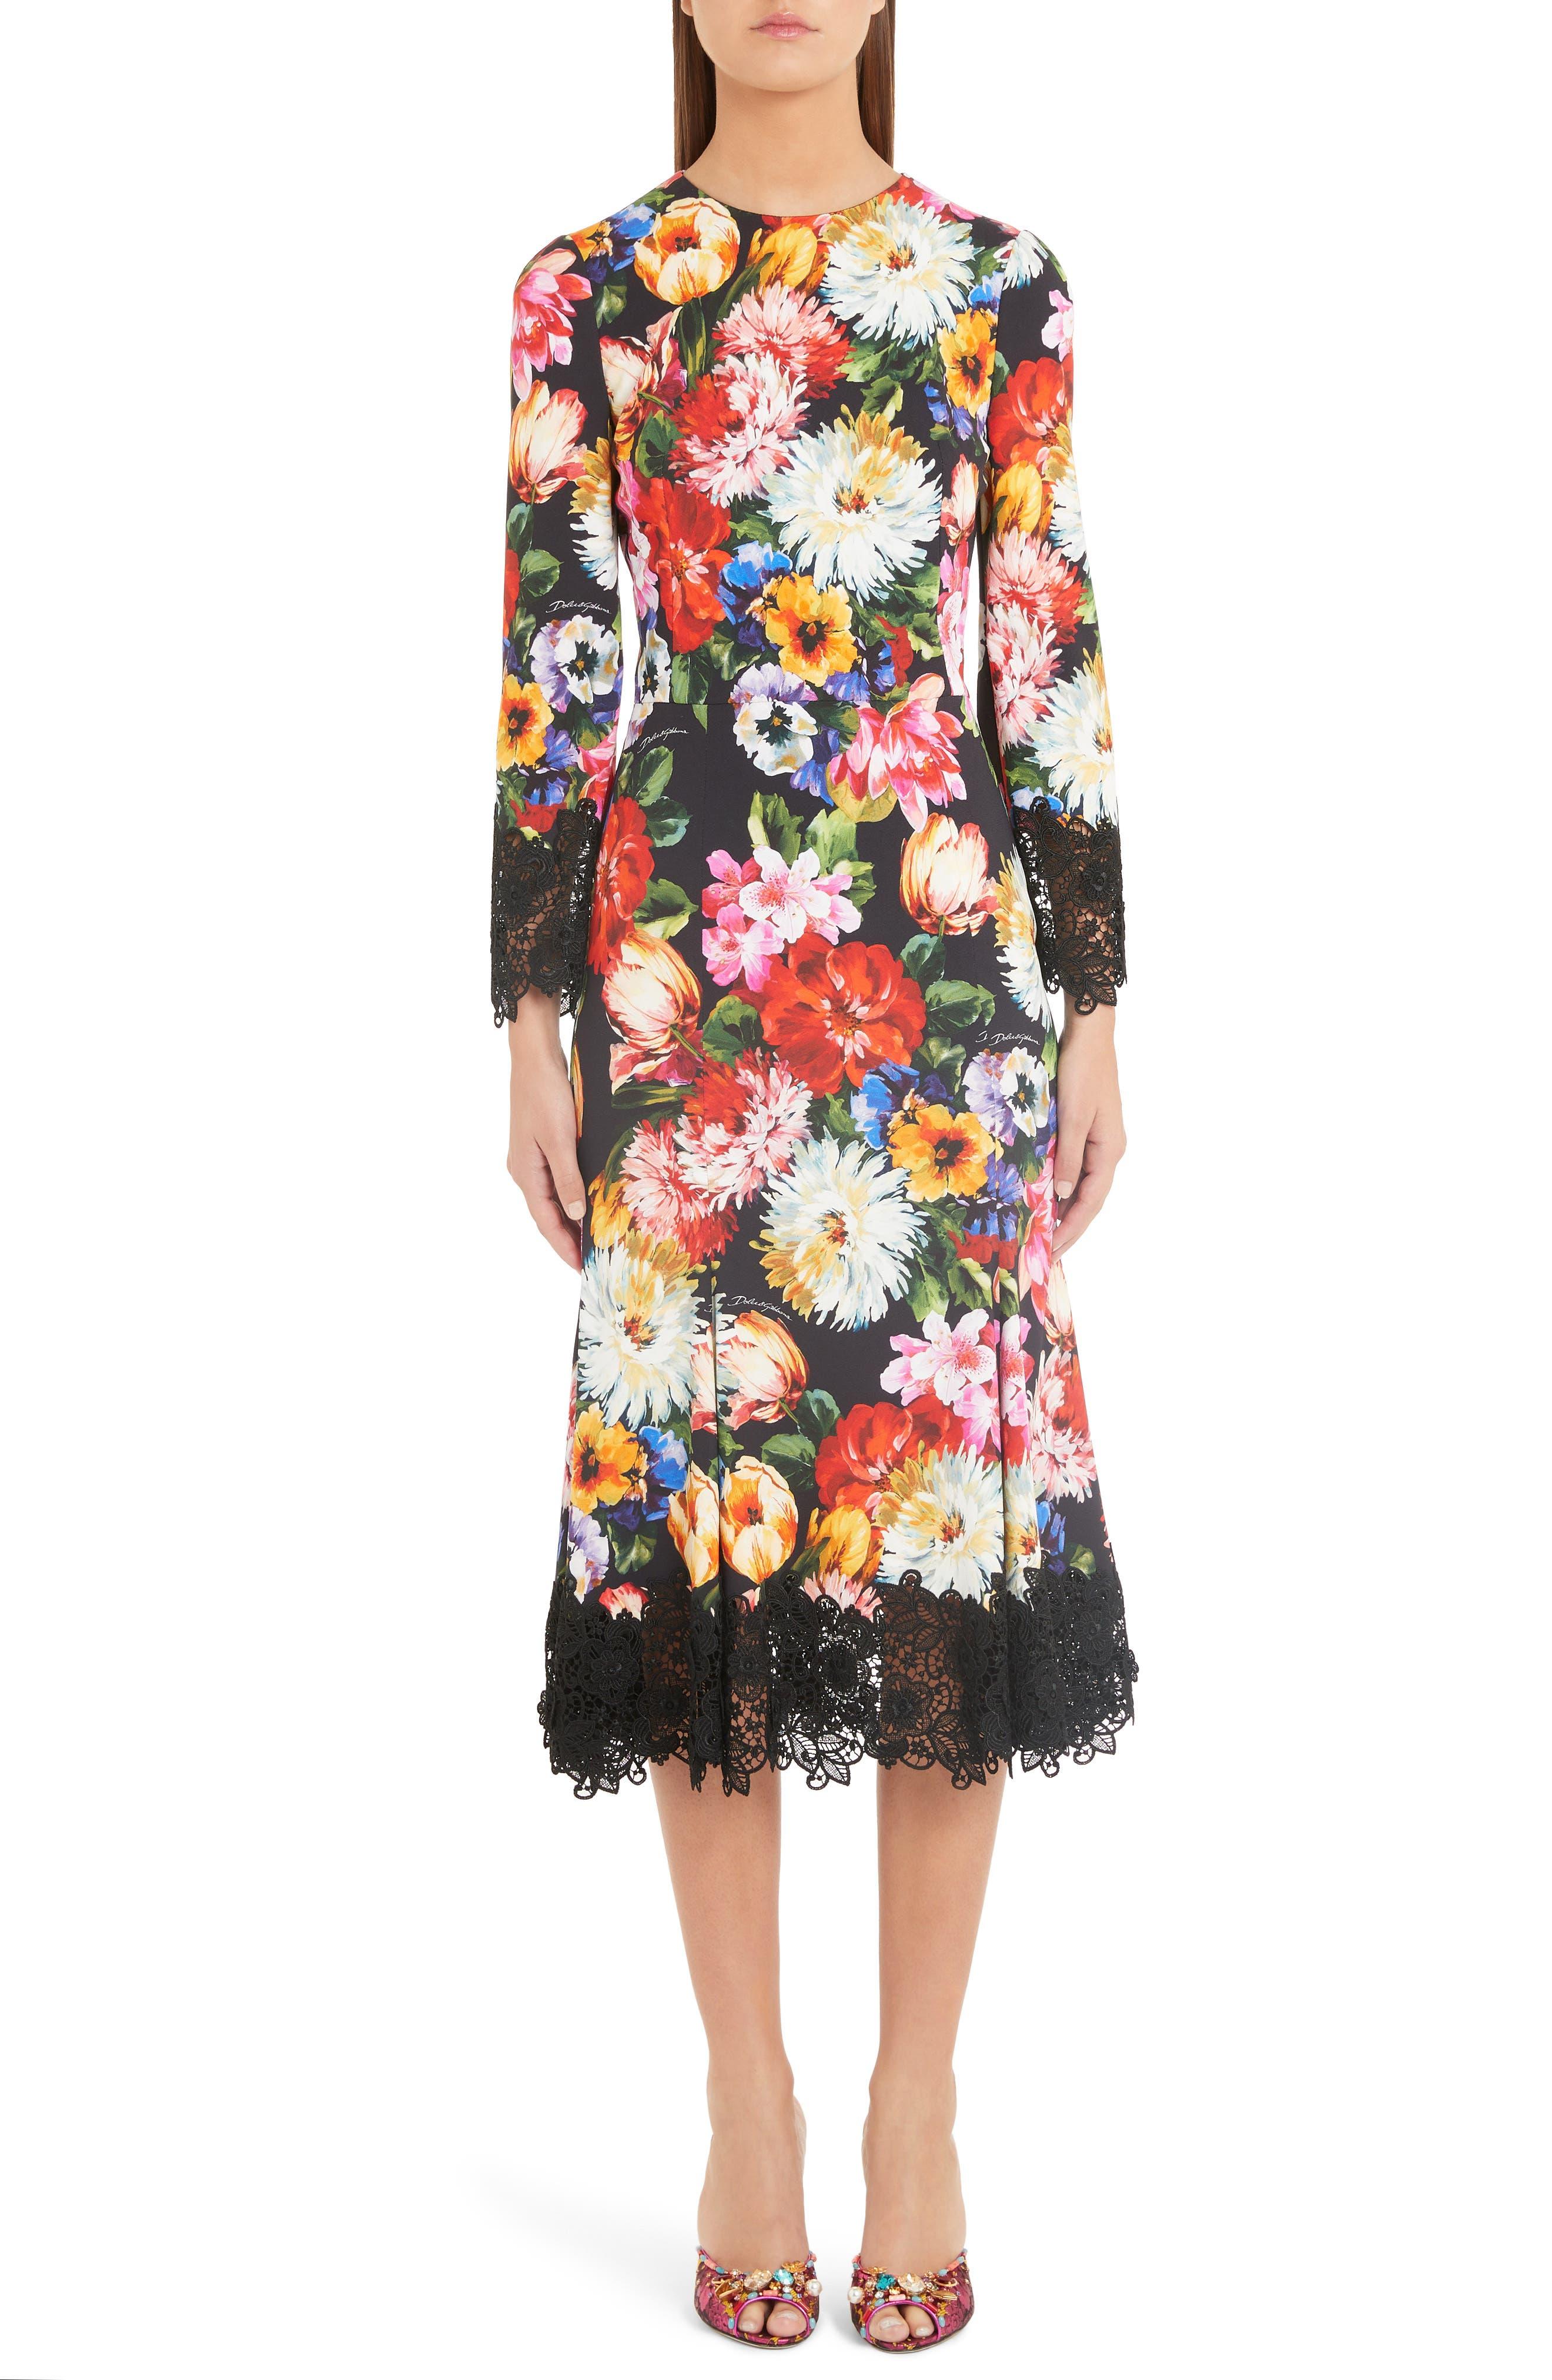 Dolce & gabbana Floral Print Lace Detail Cady Dress, US / 40 IT - Black